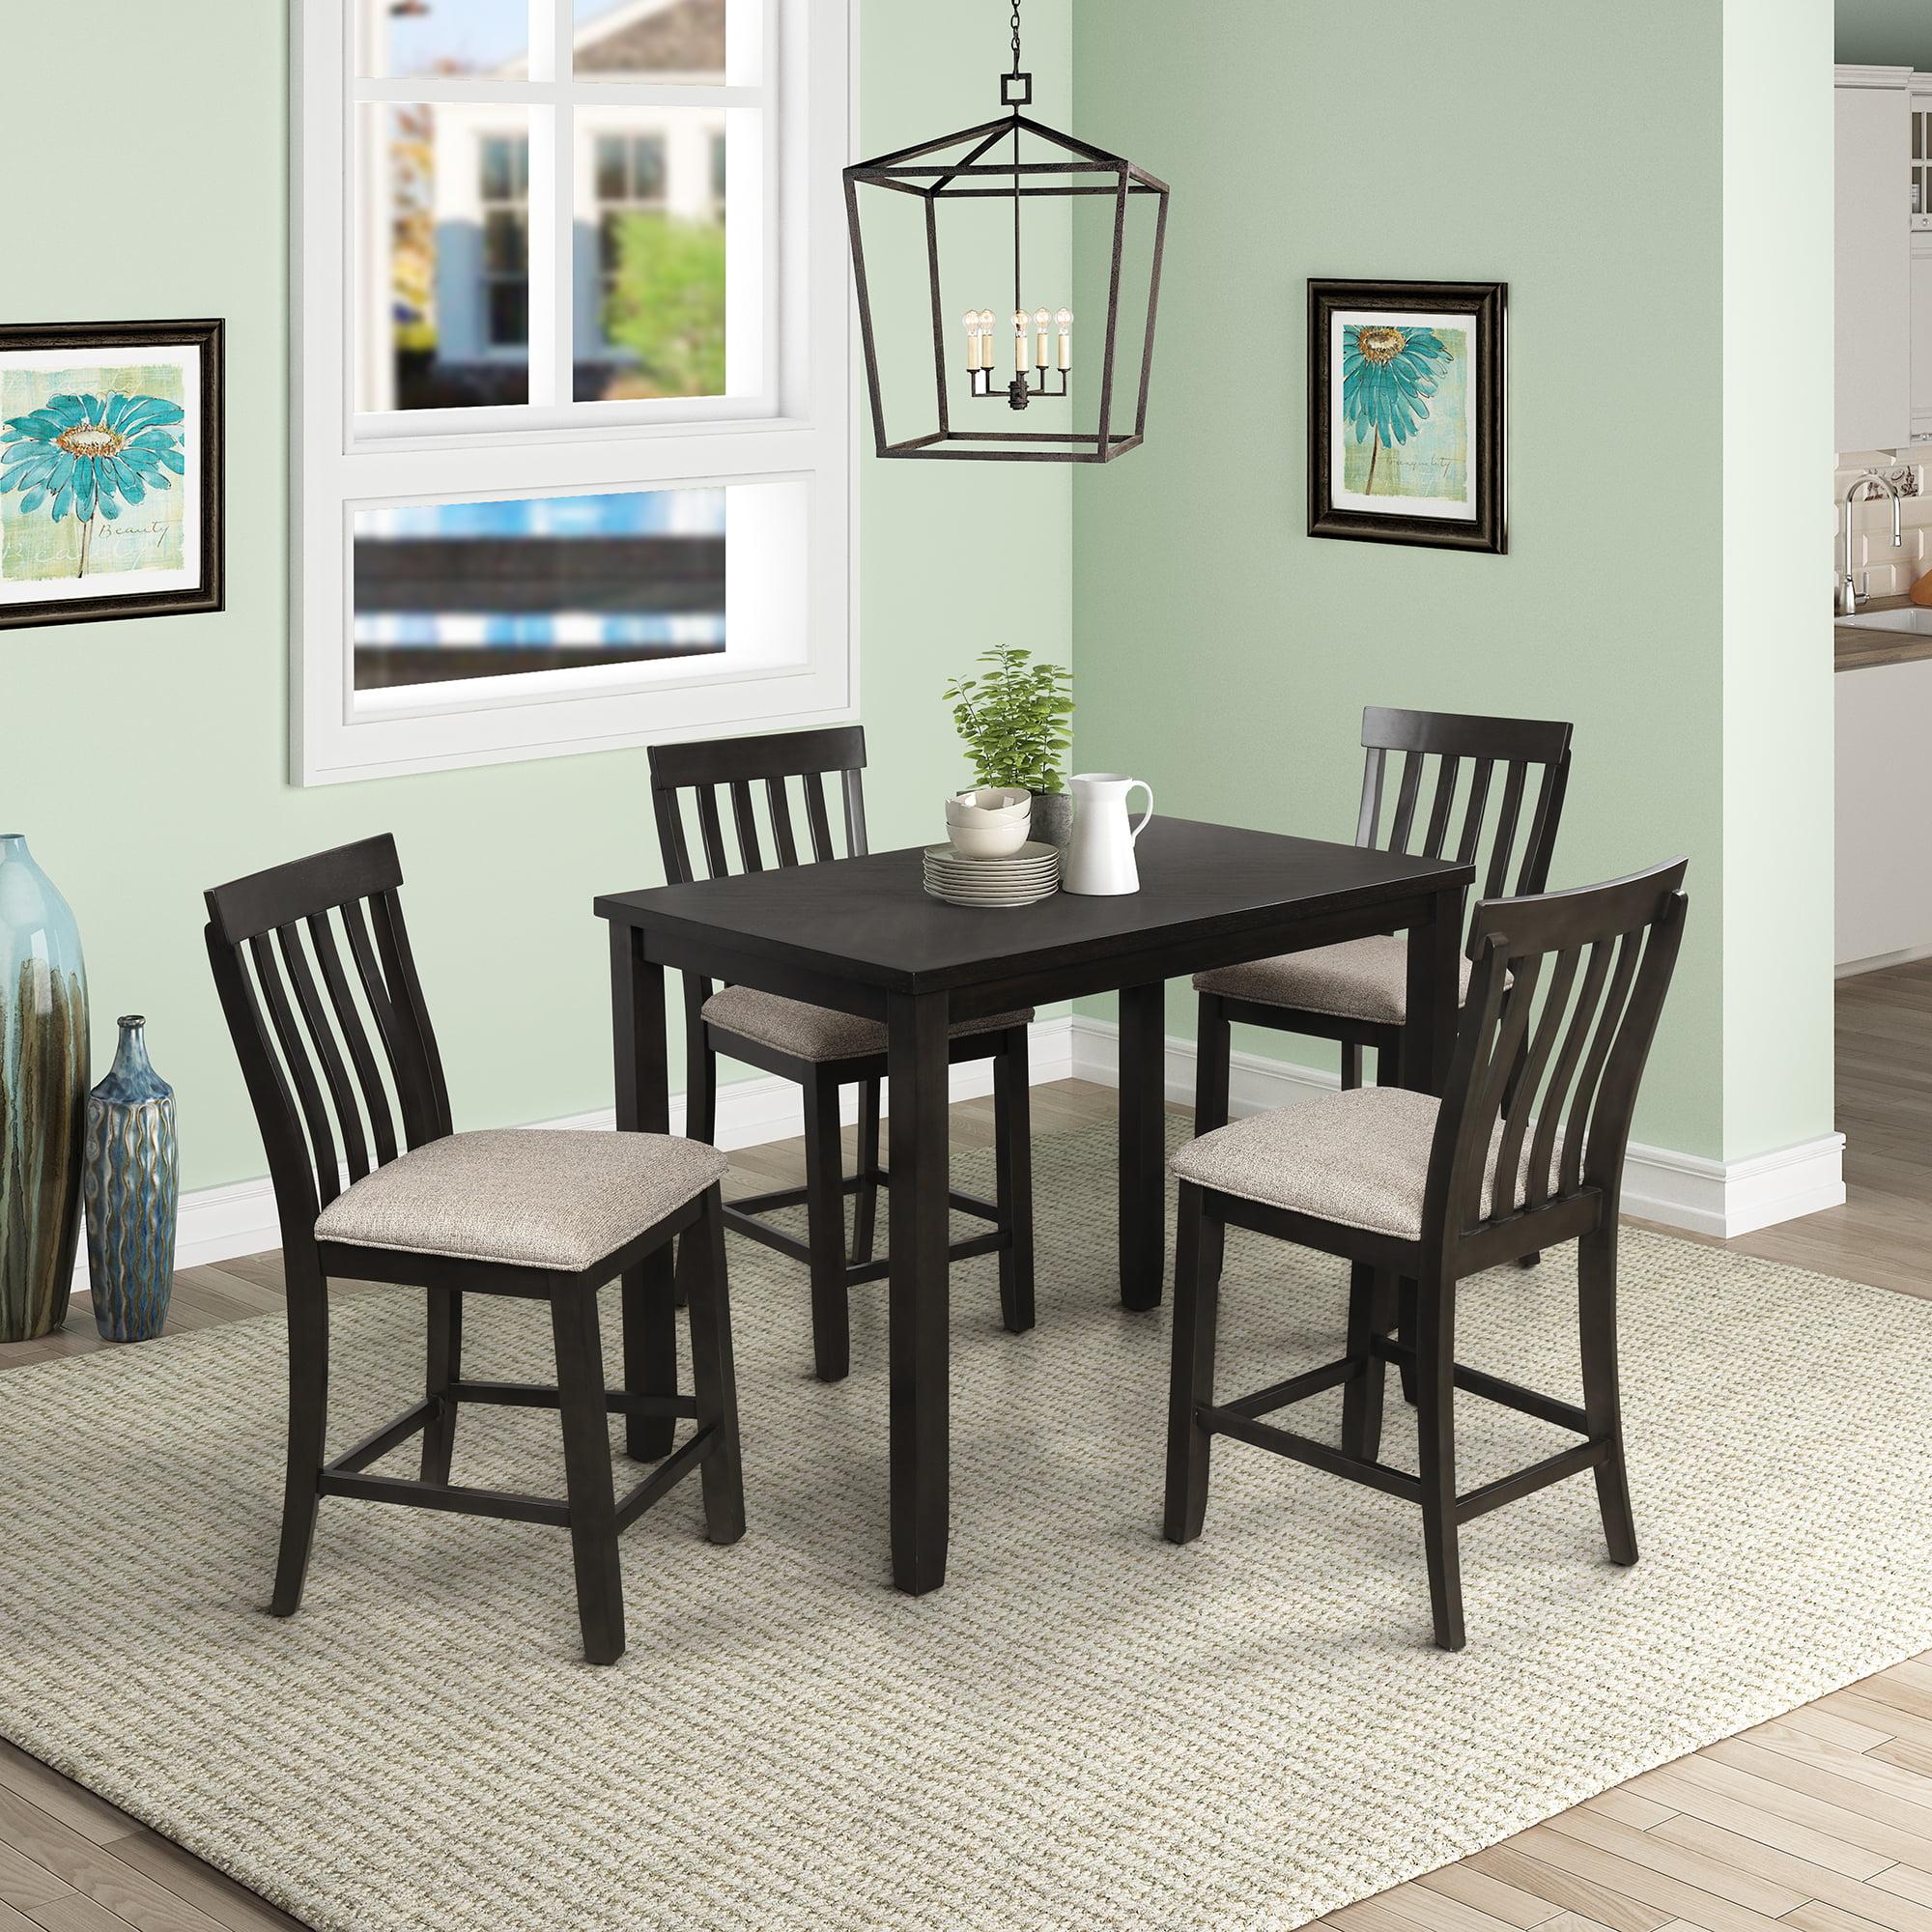 5 pieces counter height dining table set rectangular wood